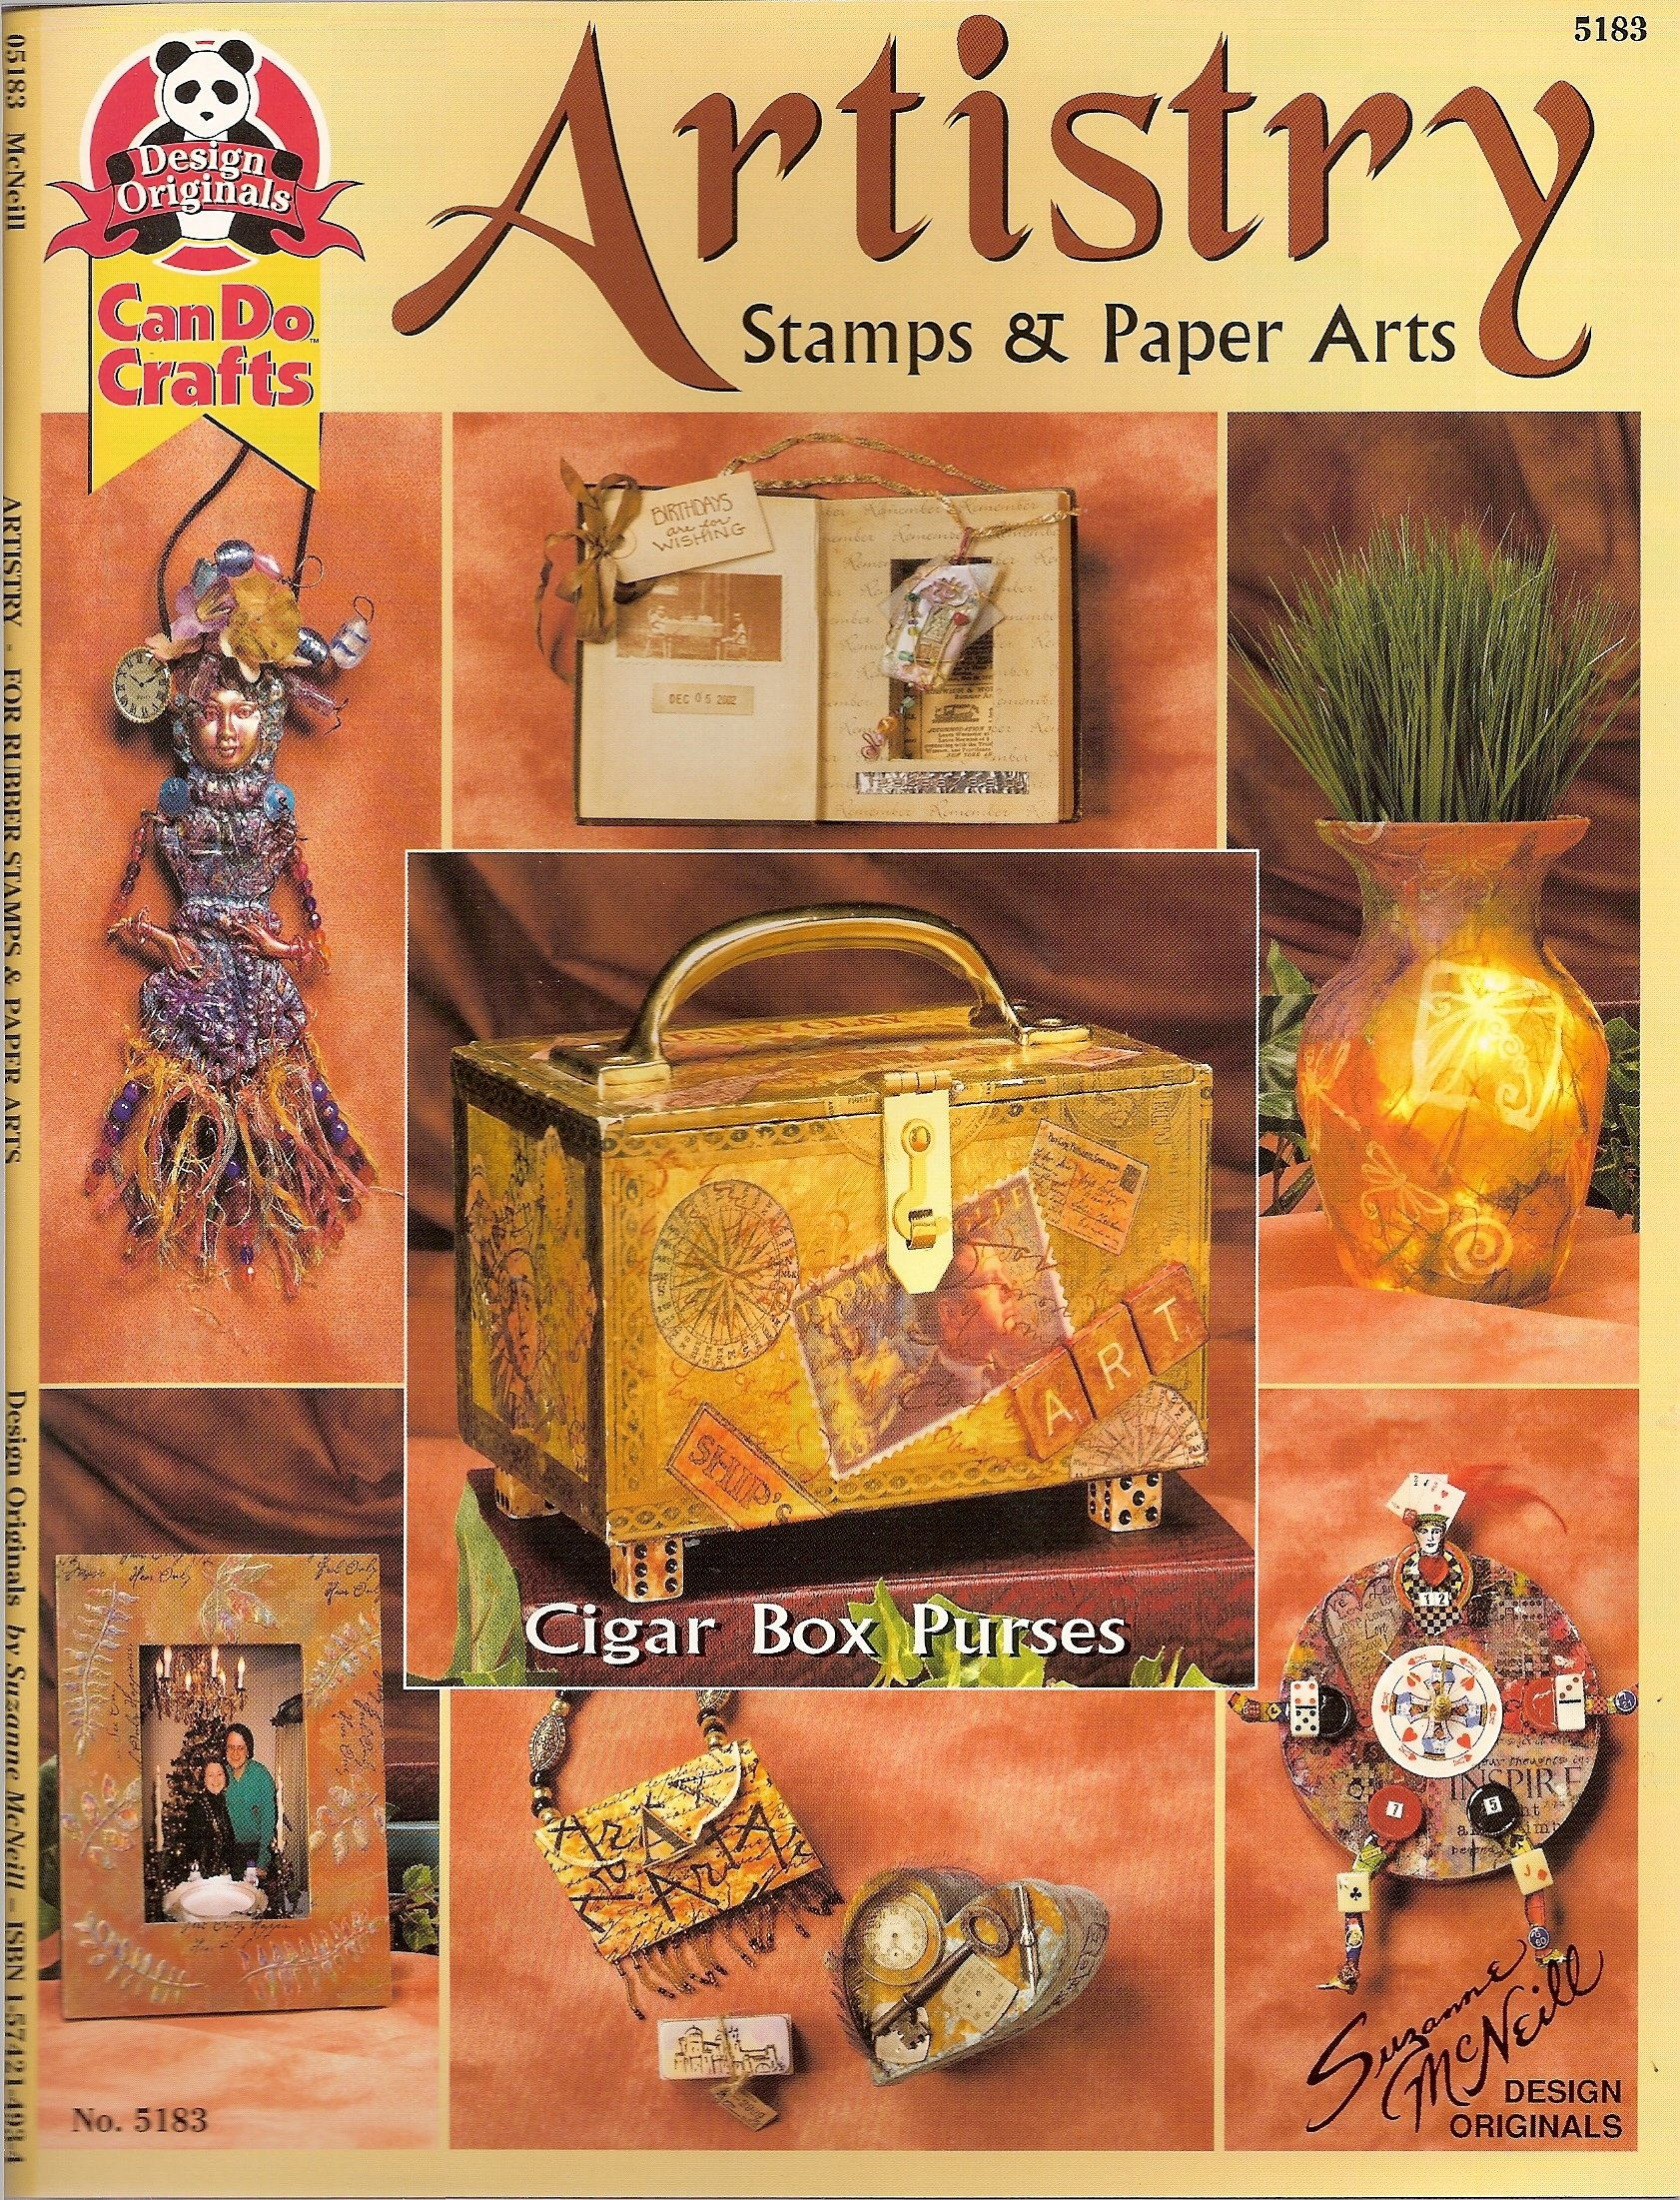 Artistry: Stamps & Paper Arts (Design Originals #5183)